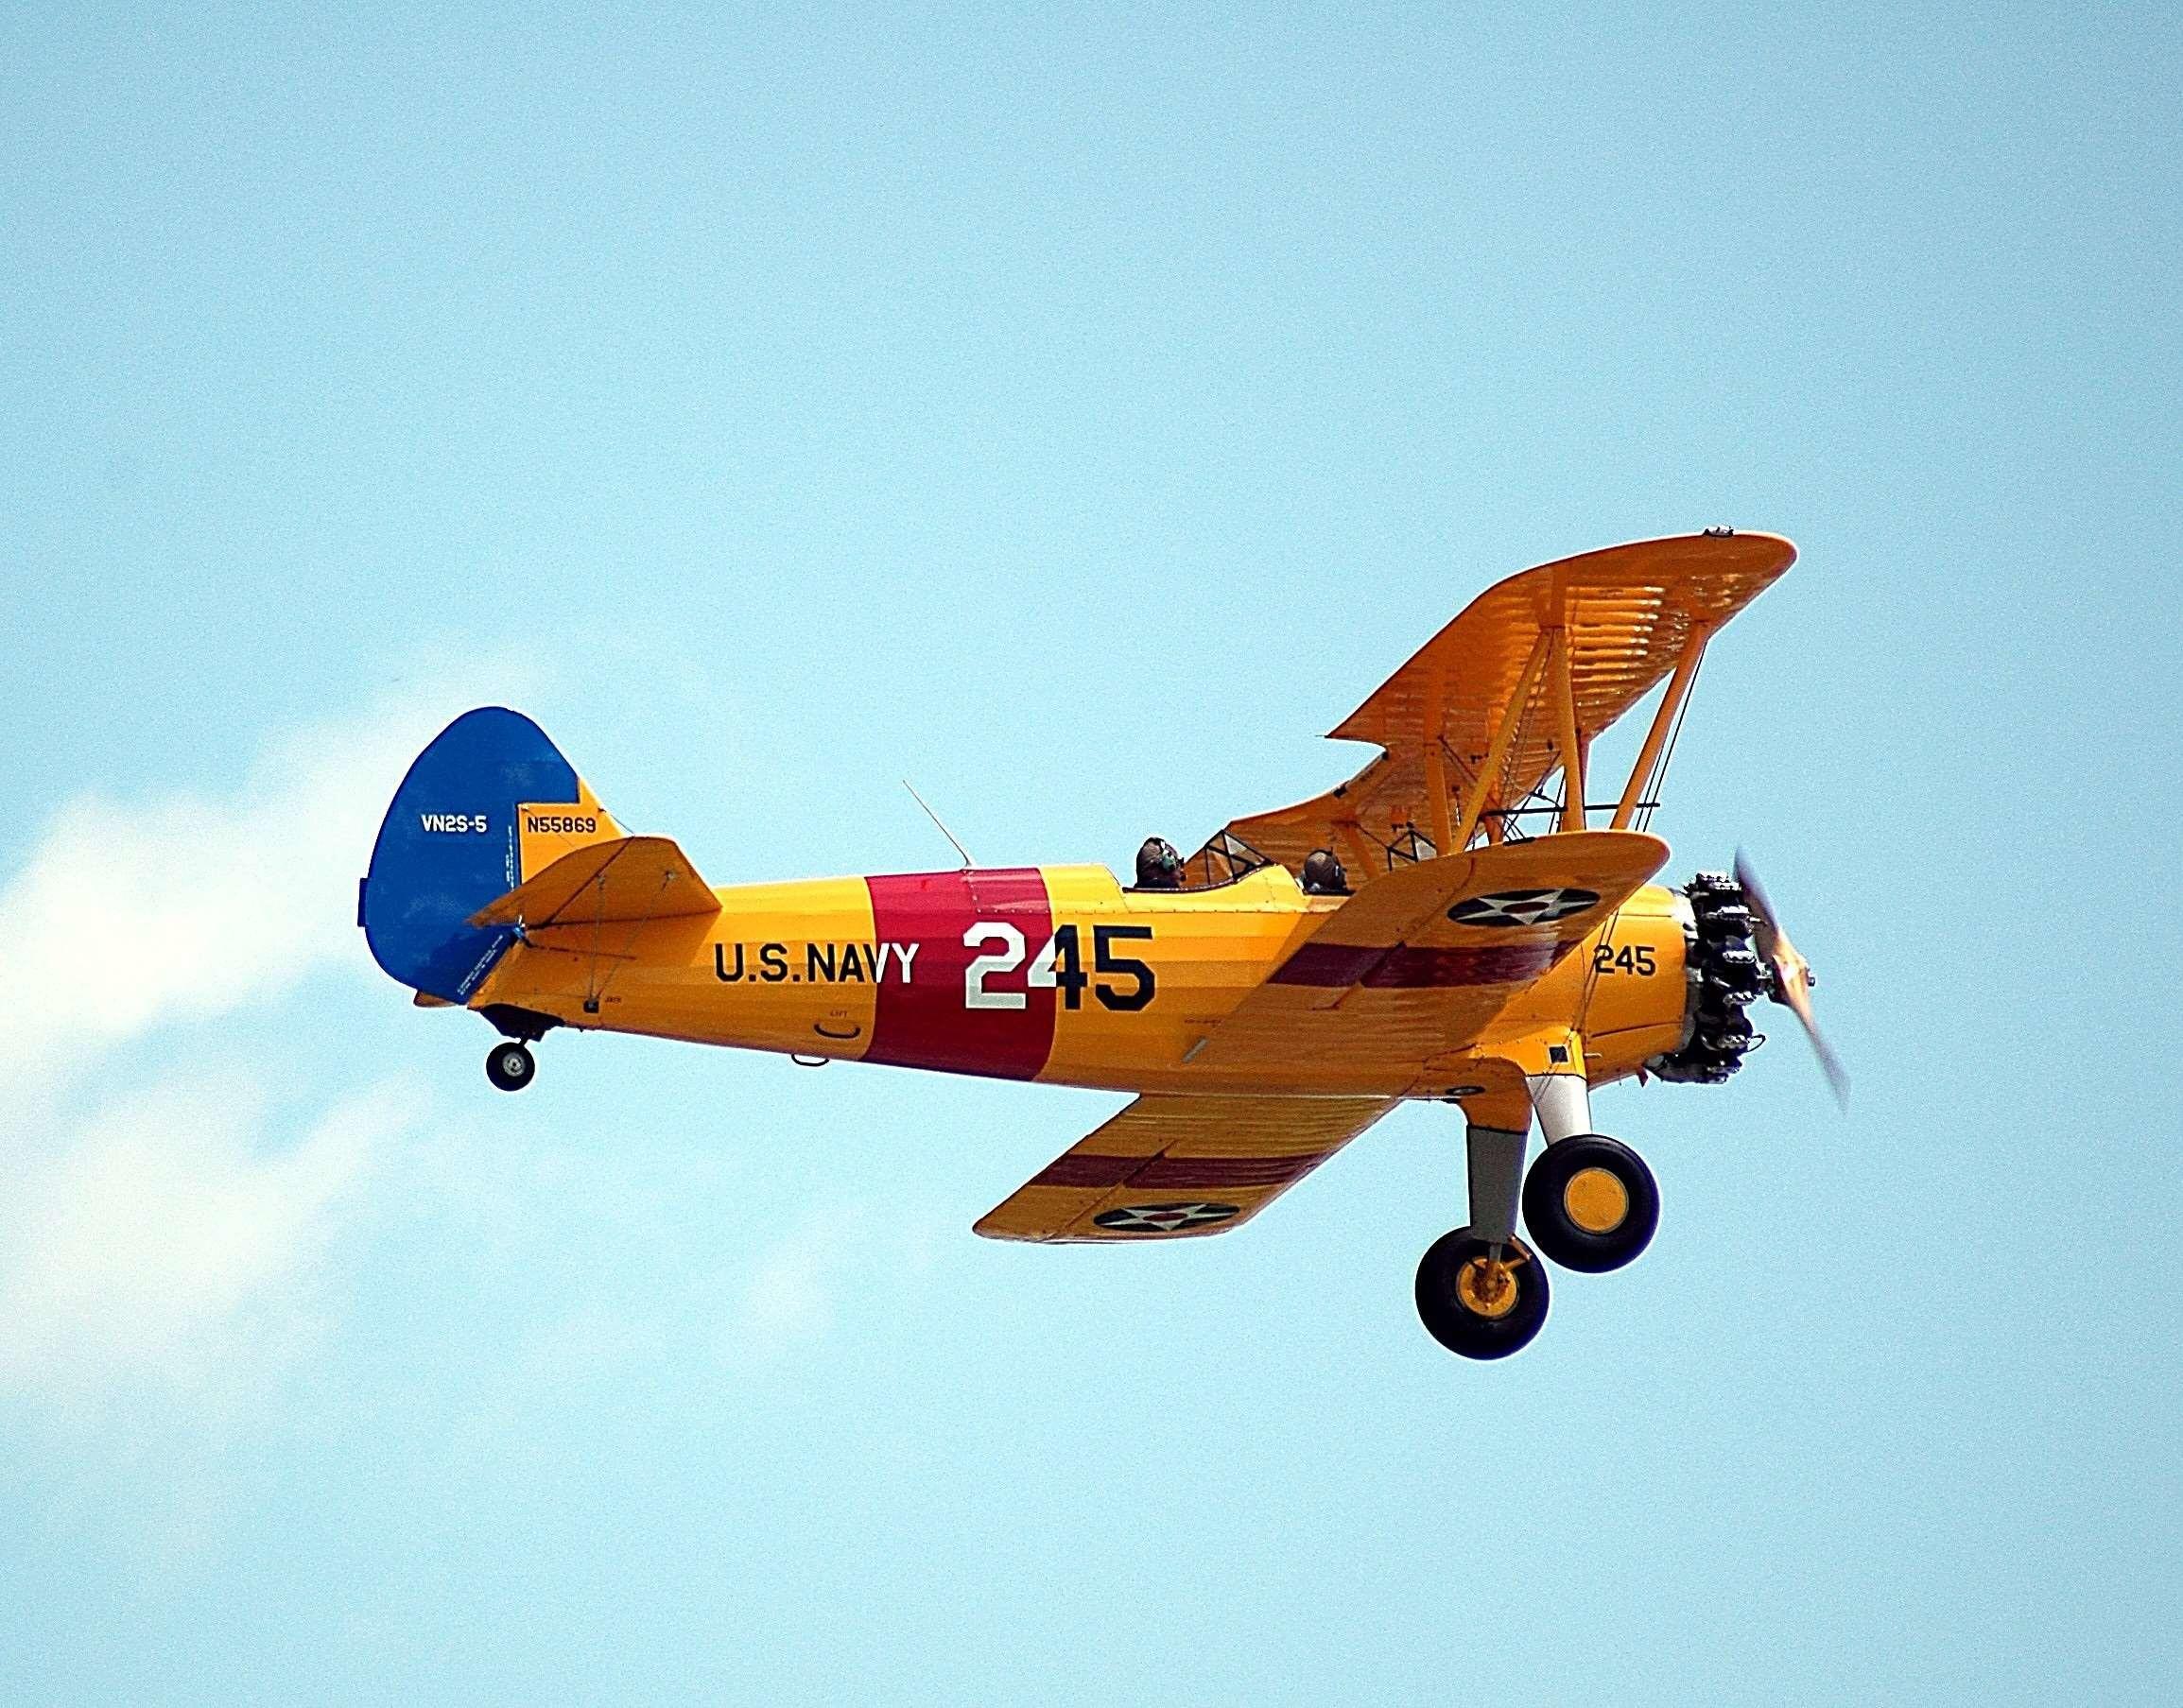 Vintage Flights and Aviation, Red Baron Triplane |Vintage Jet Planes